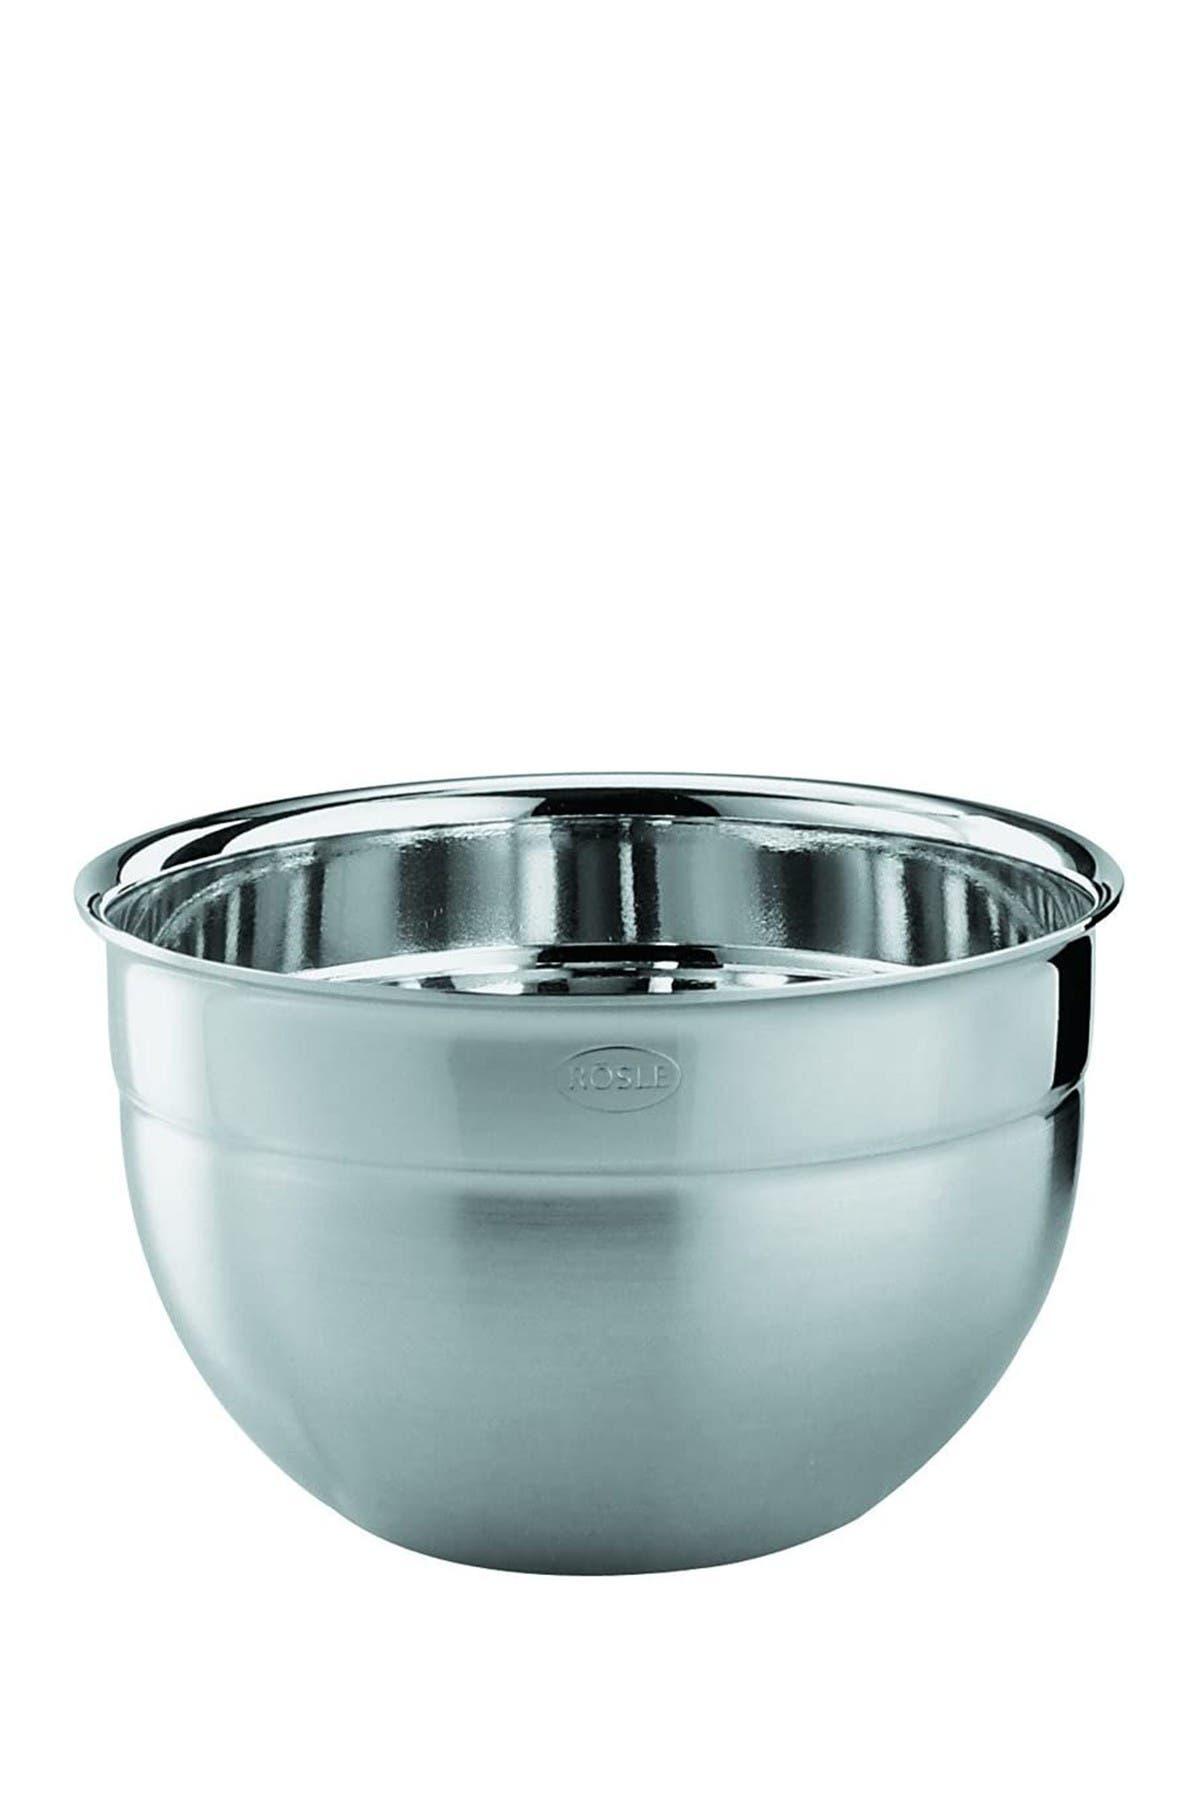 Image of Rosle Marinade Bowl